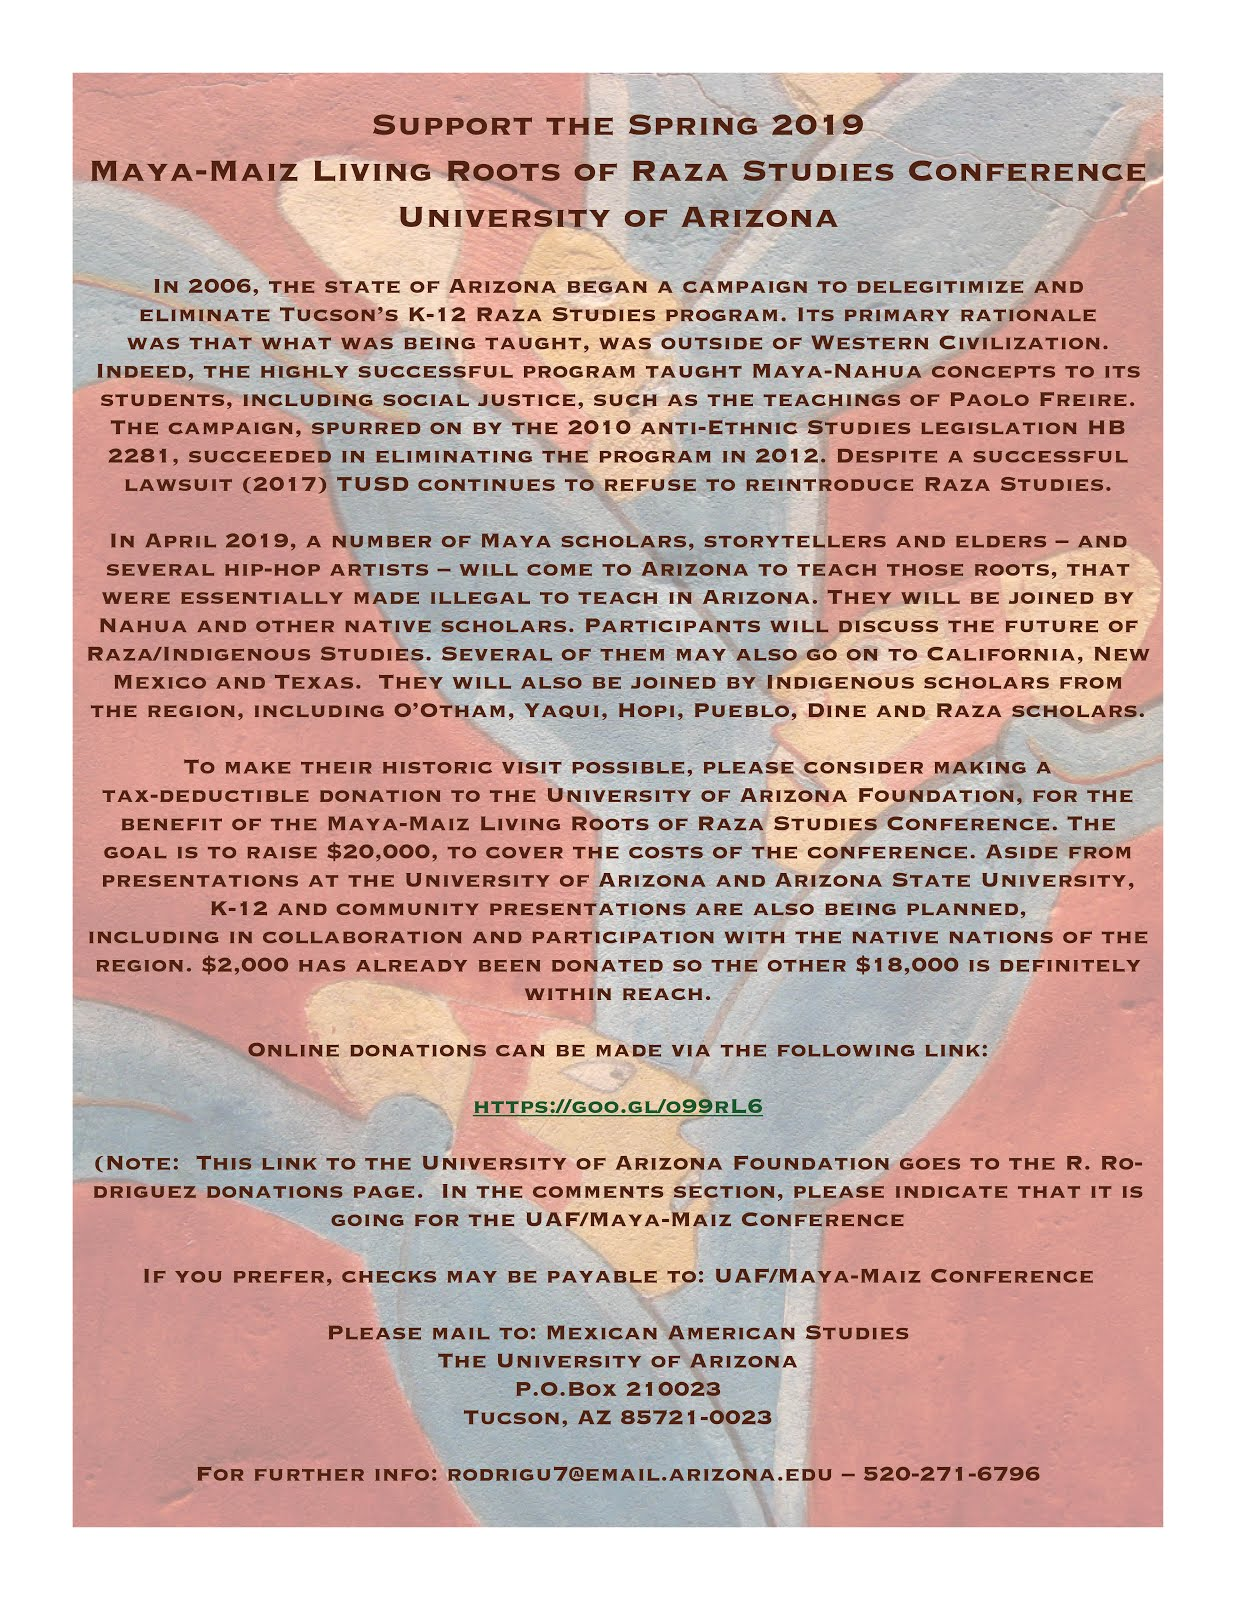 Dr Cintli: The Maya-Maiz Living Roots Raza Studies